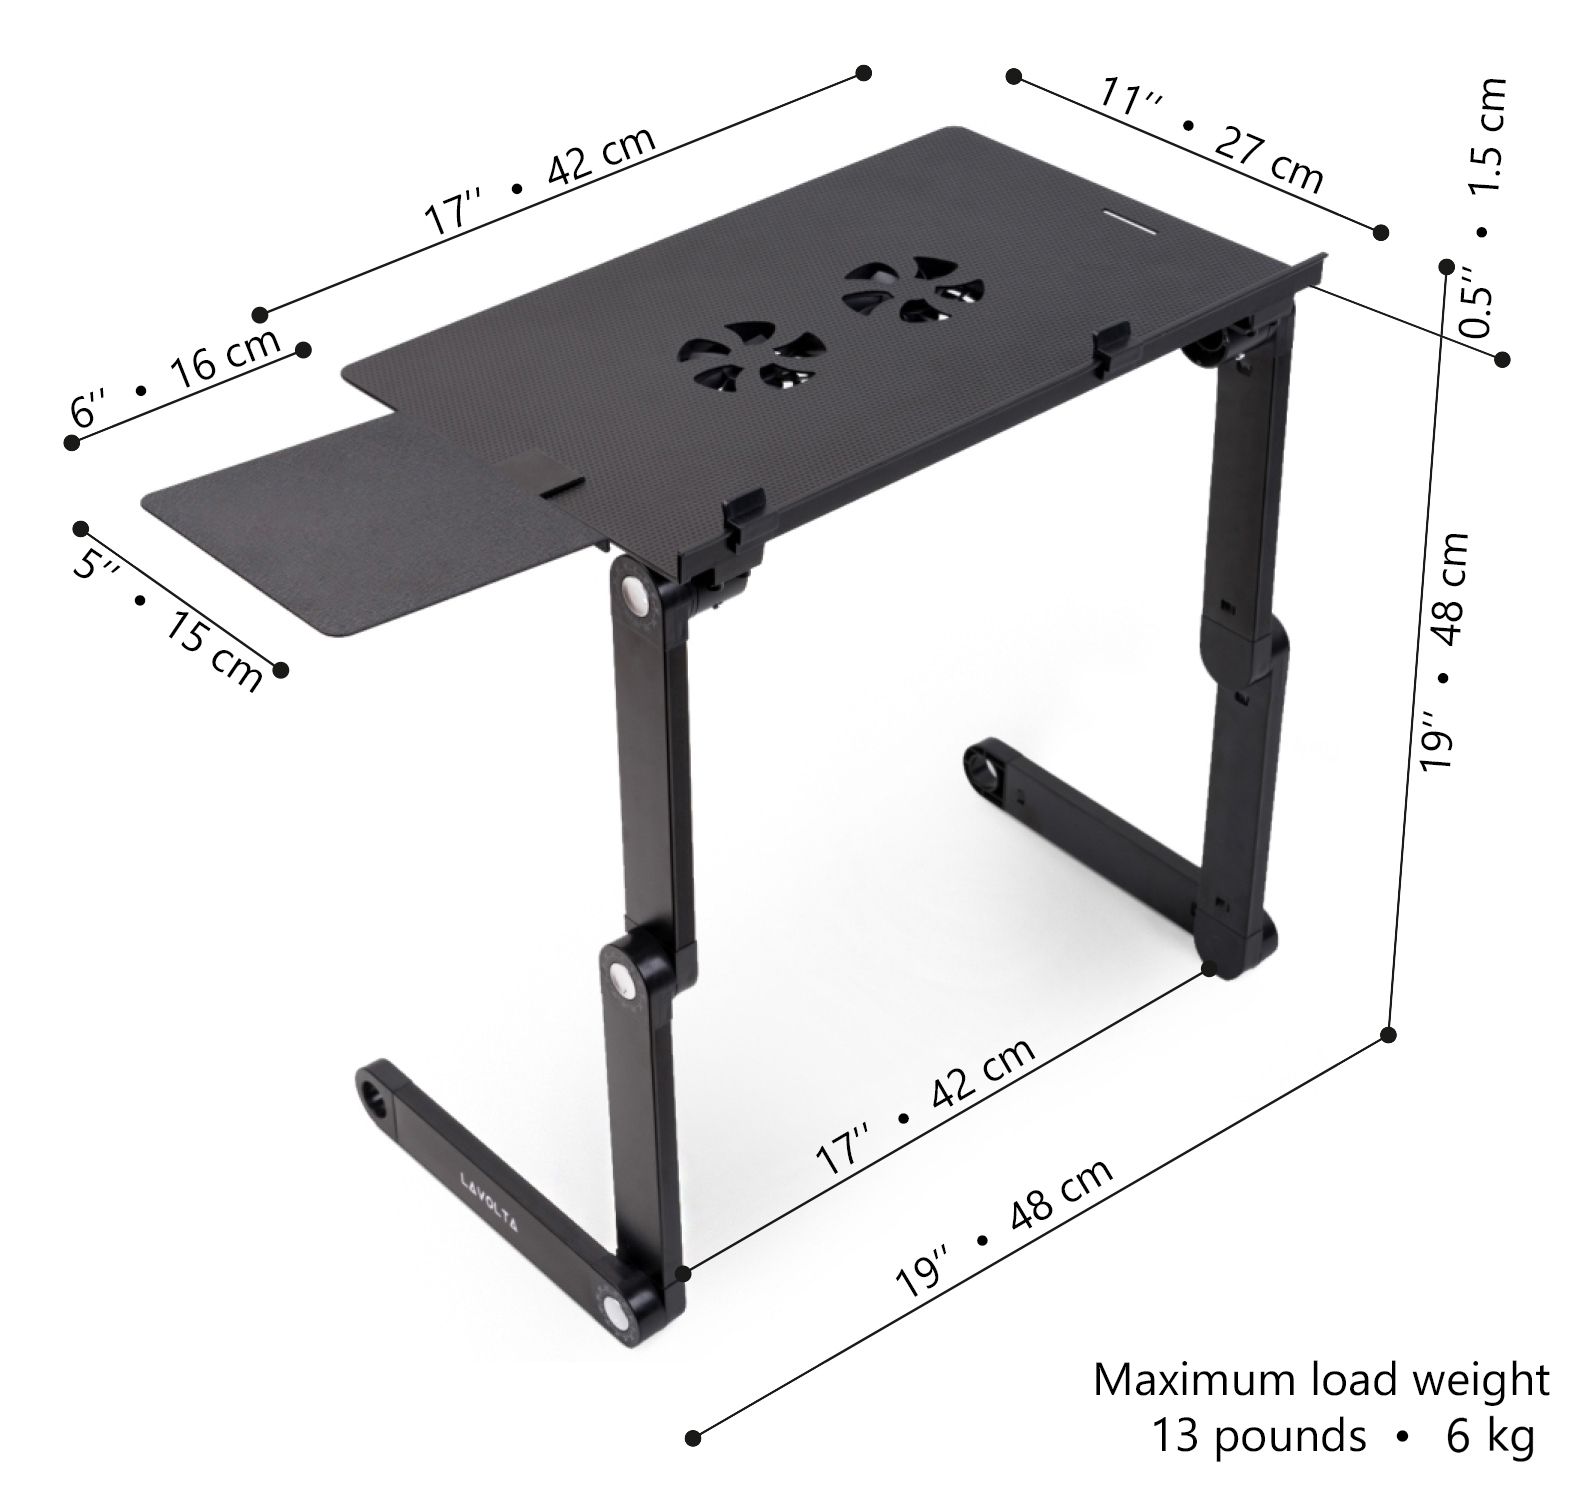 lavolta notebook laptop st nder tisch k hler mit mauspad. Black Bedroom Furniture Sets. Home Design Ideas